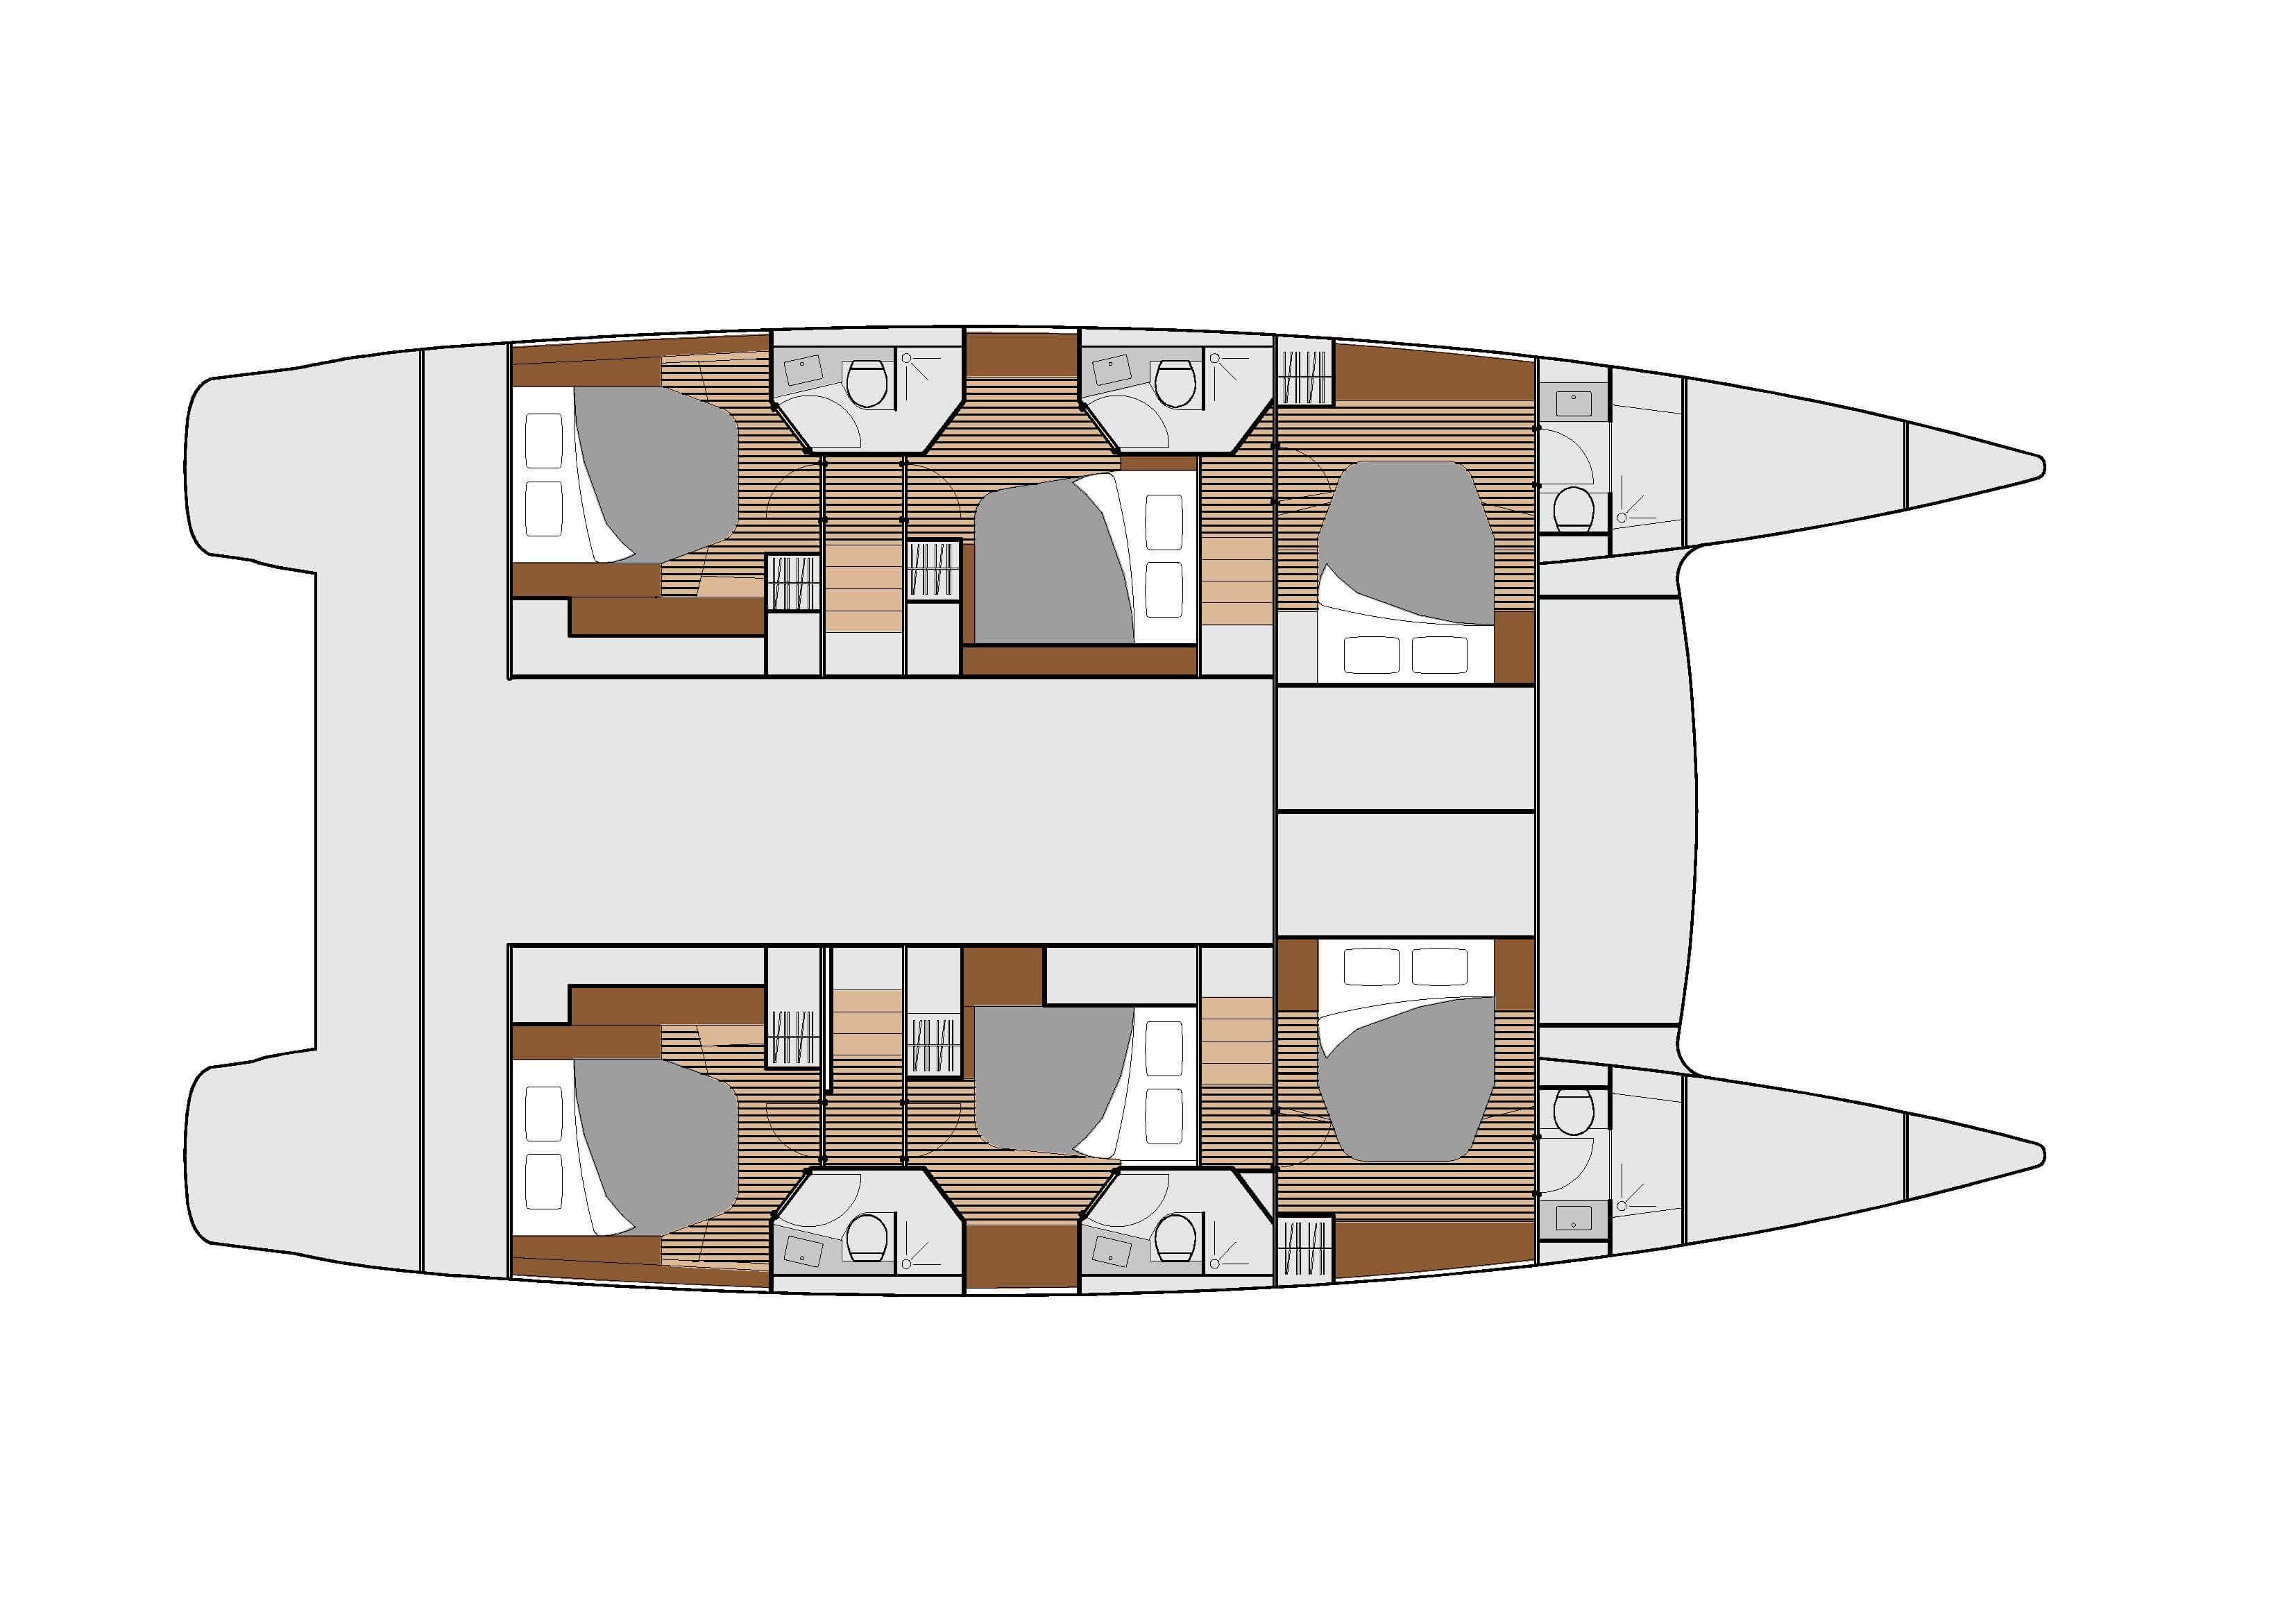 ip58-1-layout